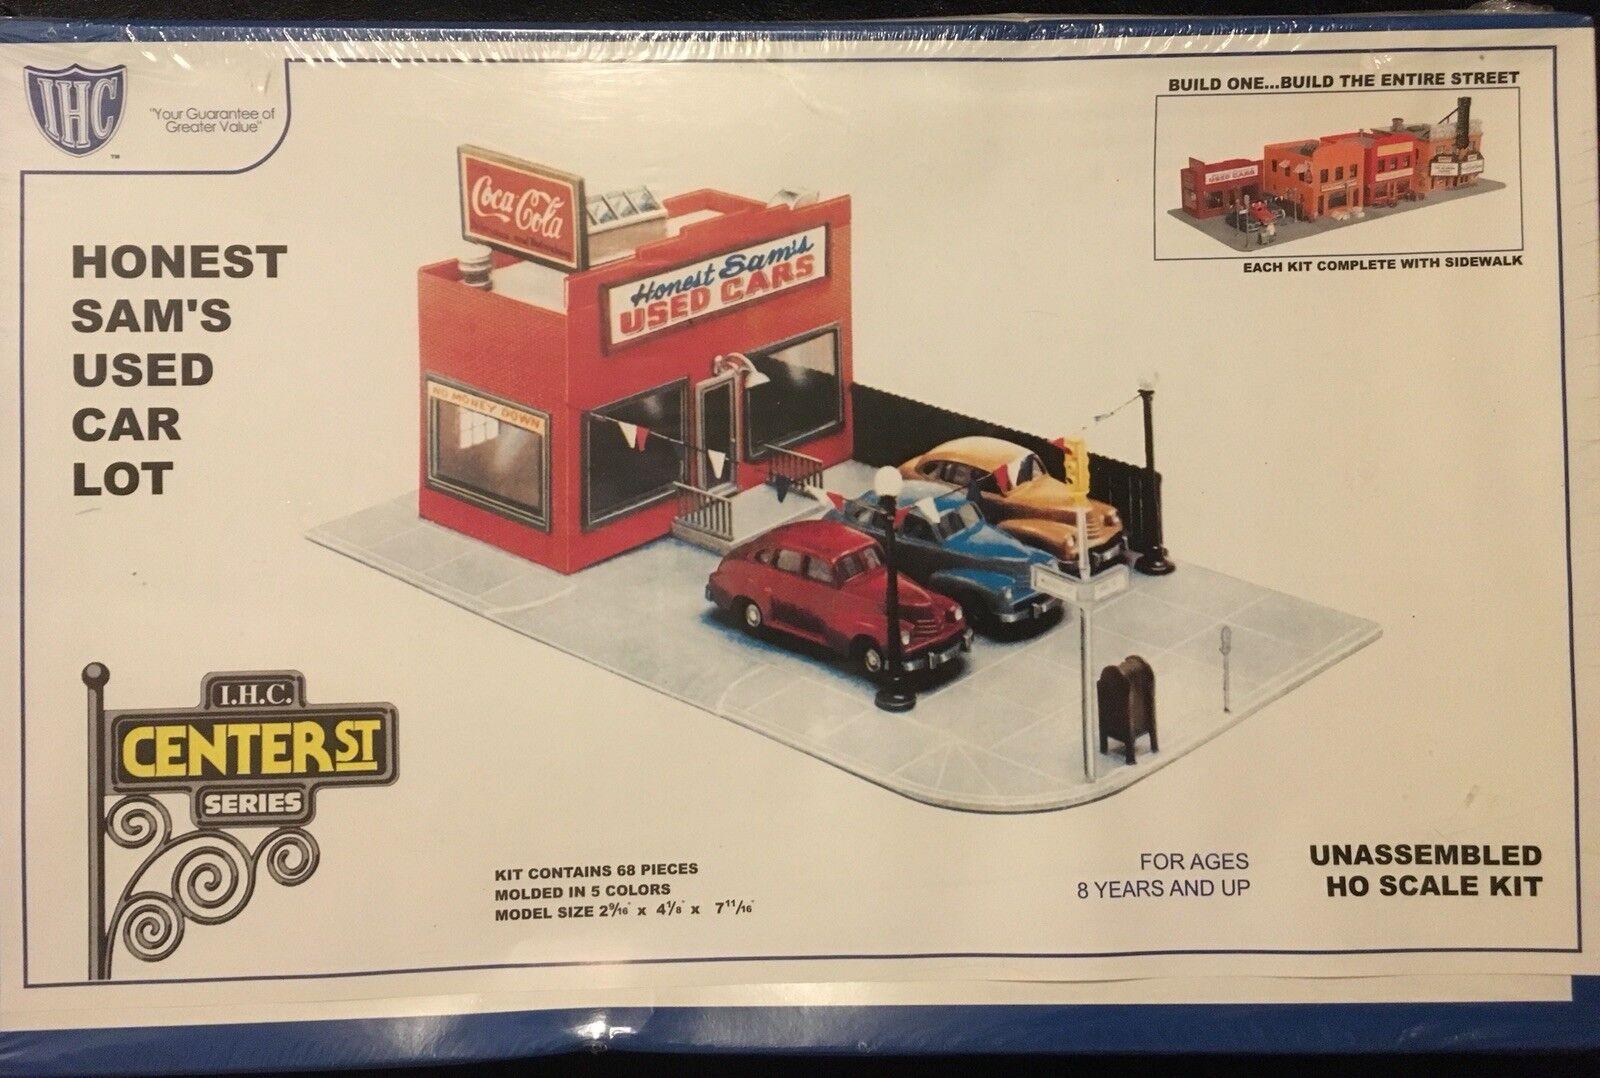 IHC ho Scale Kit 4-7796 Honest Sam's Used Car Lot Center St Series NIB